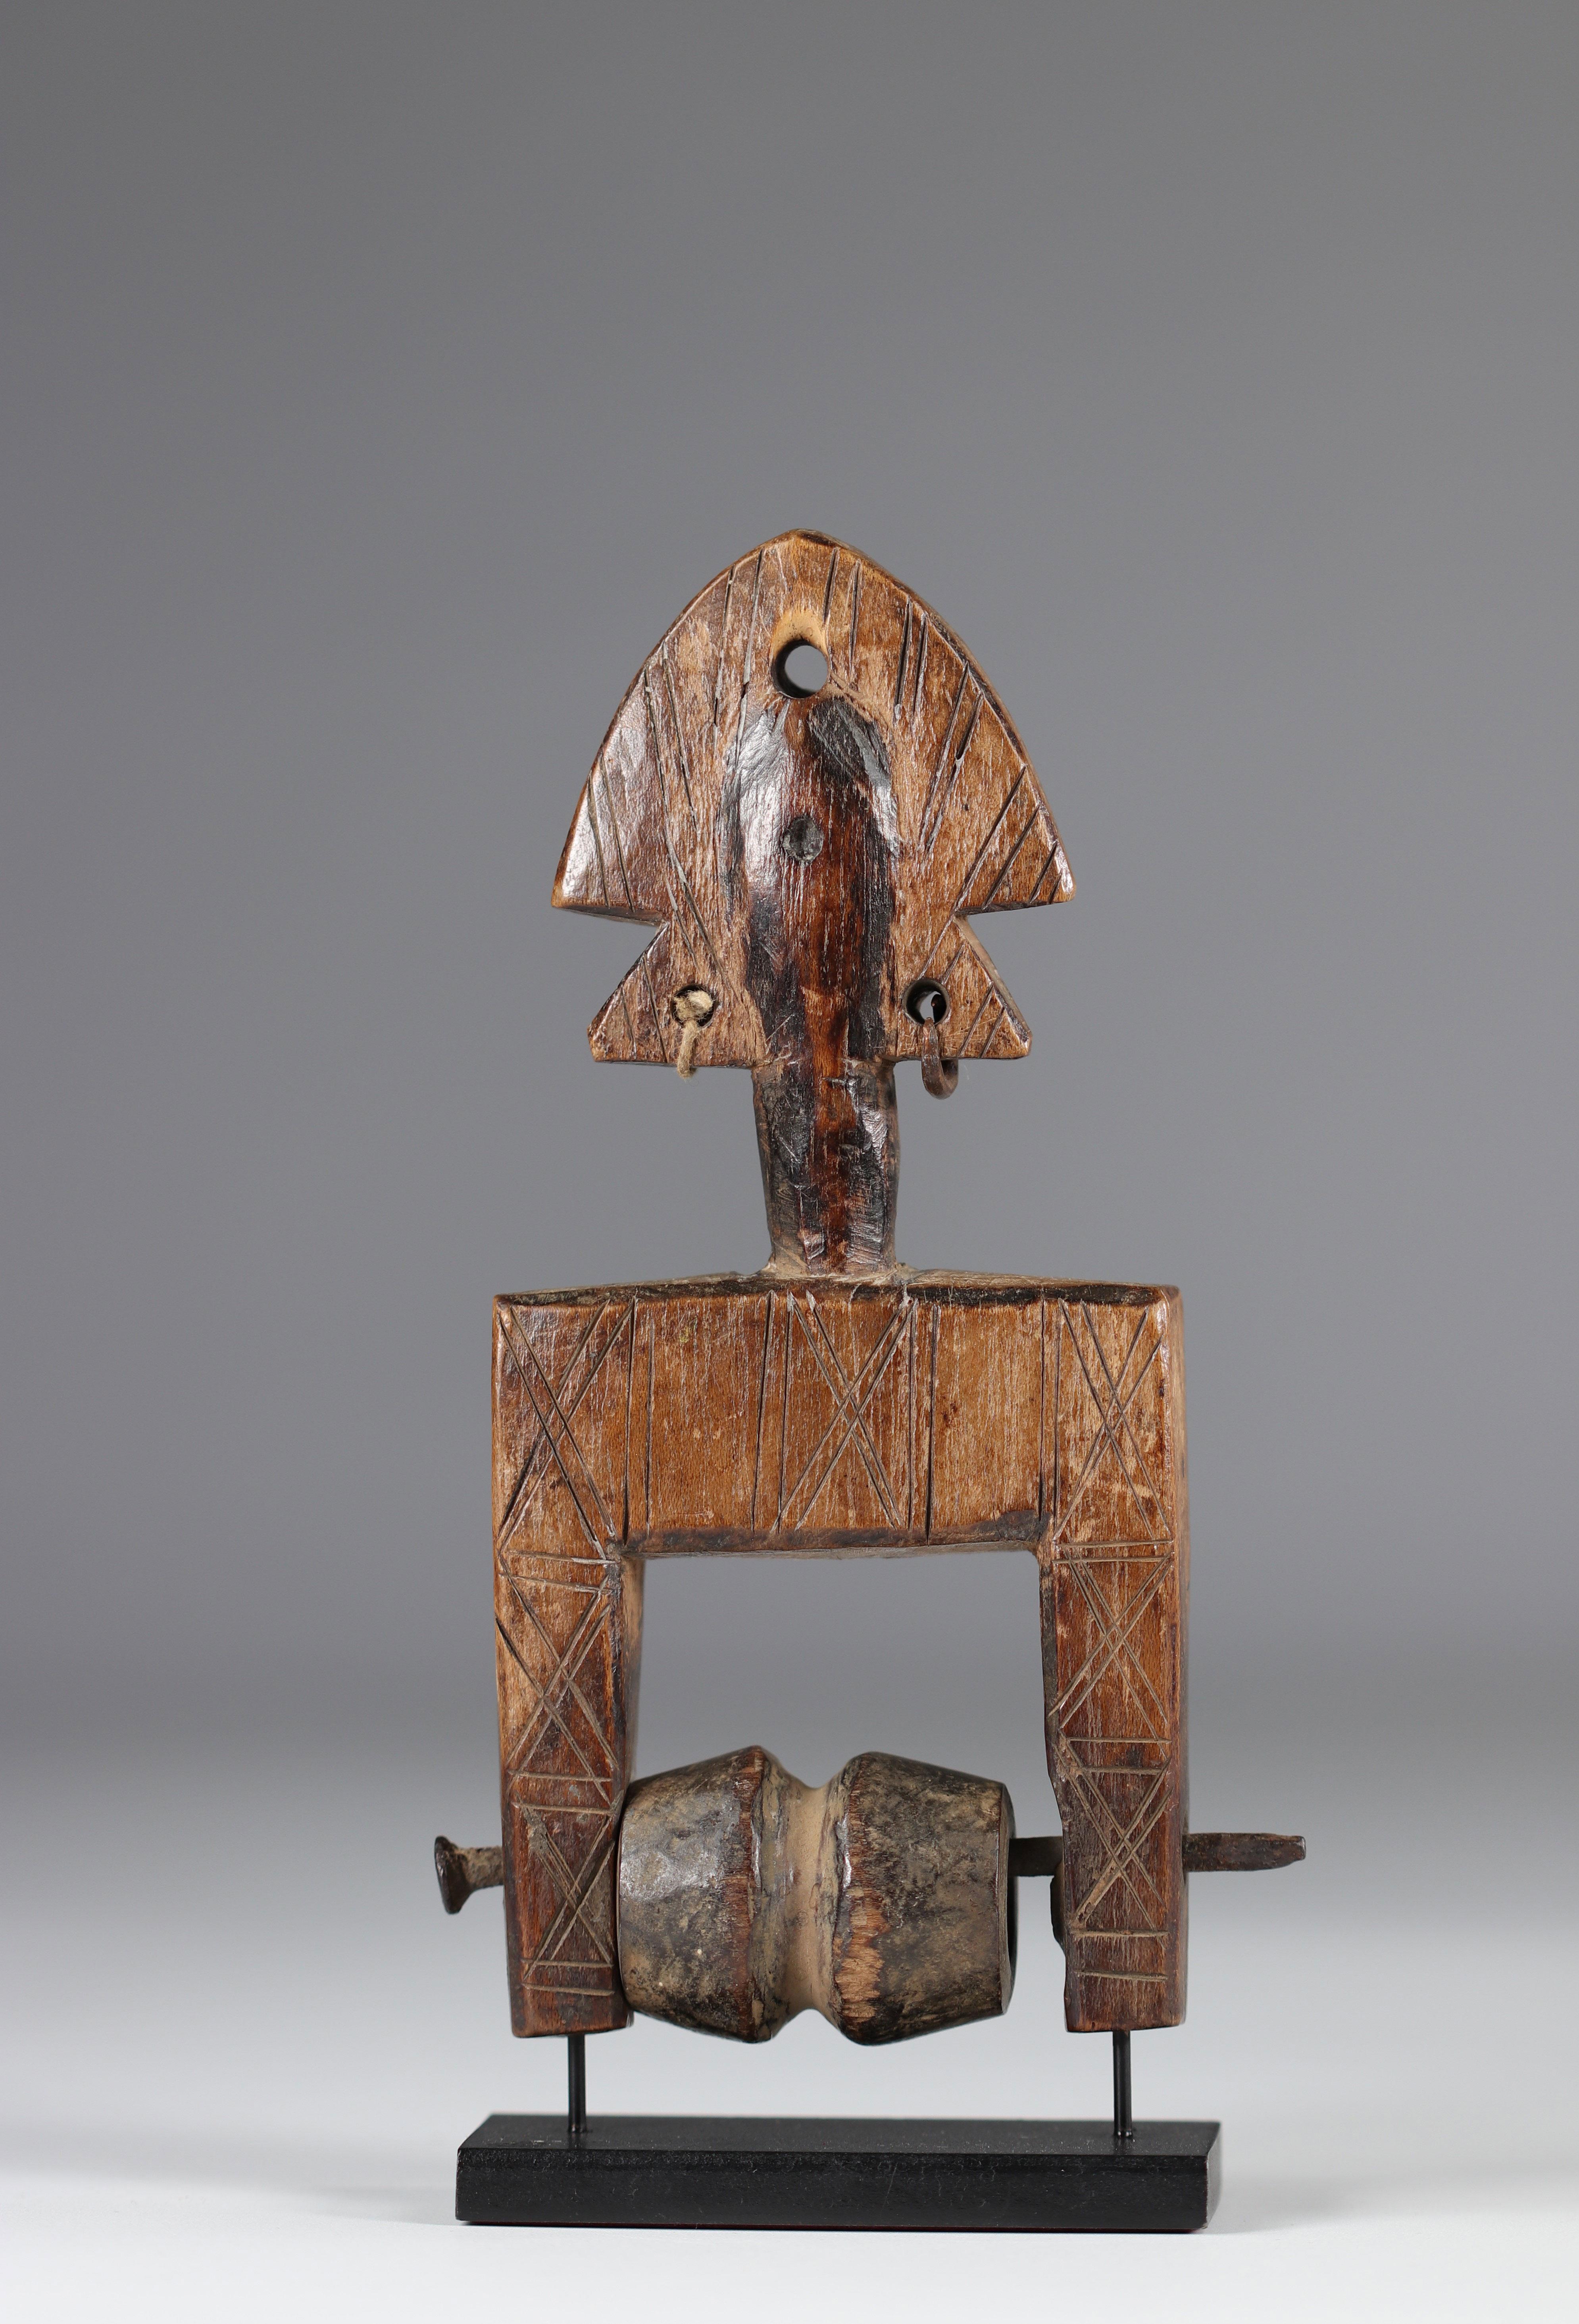 Bamana Ivory Coast mid 20th century pulley - Image 5 of 5